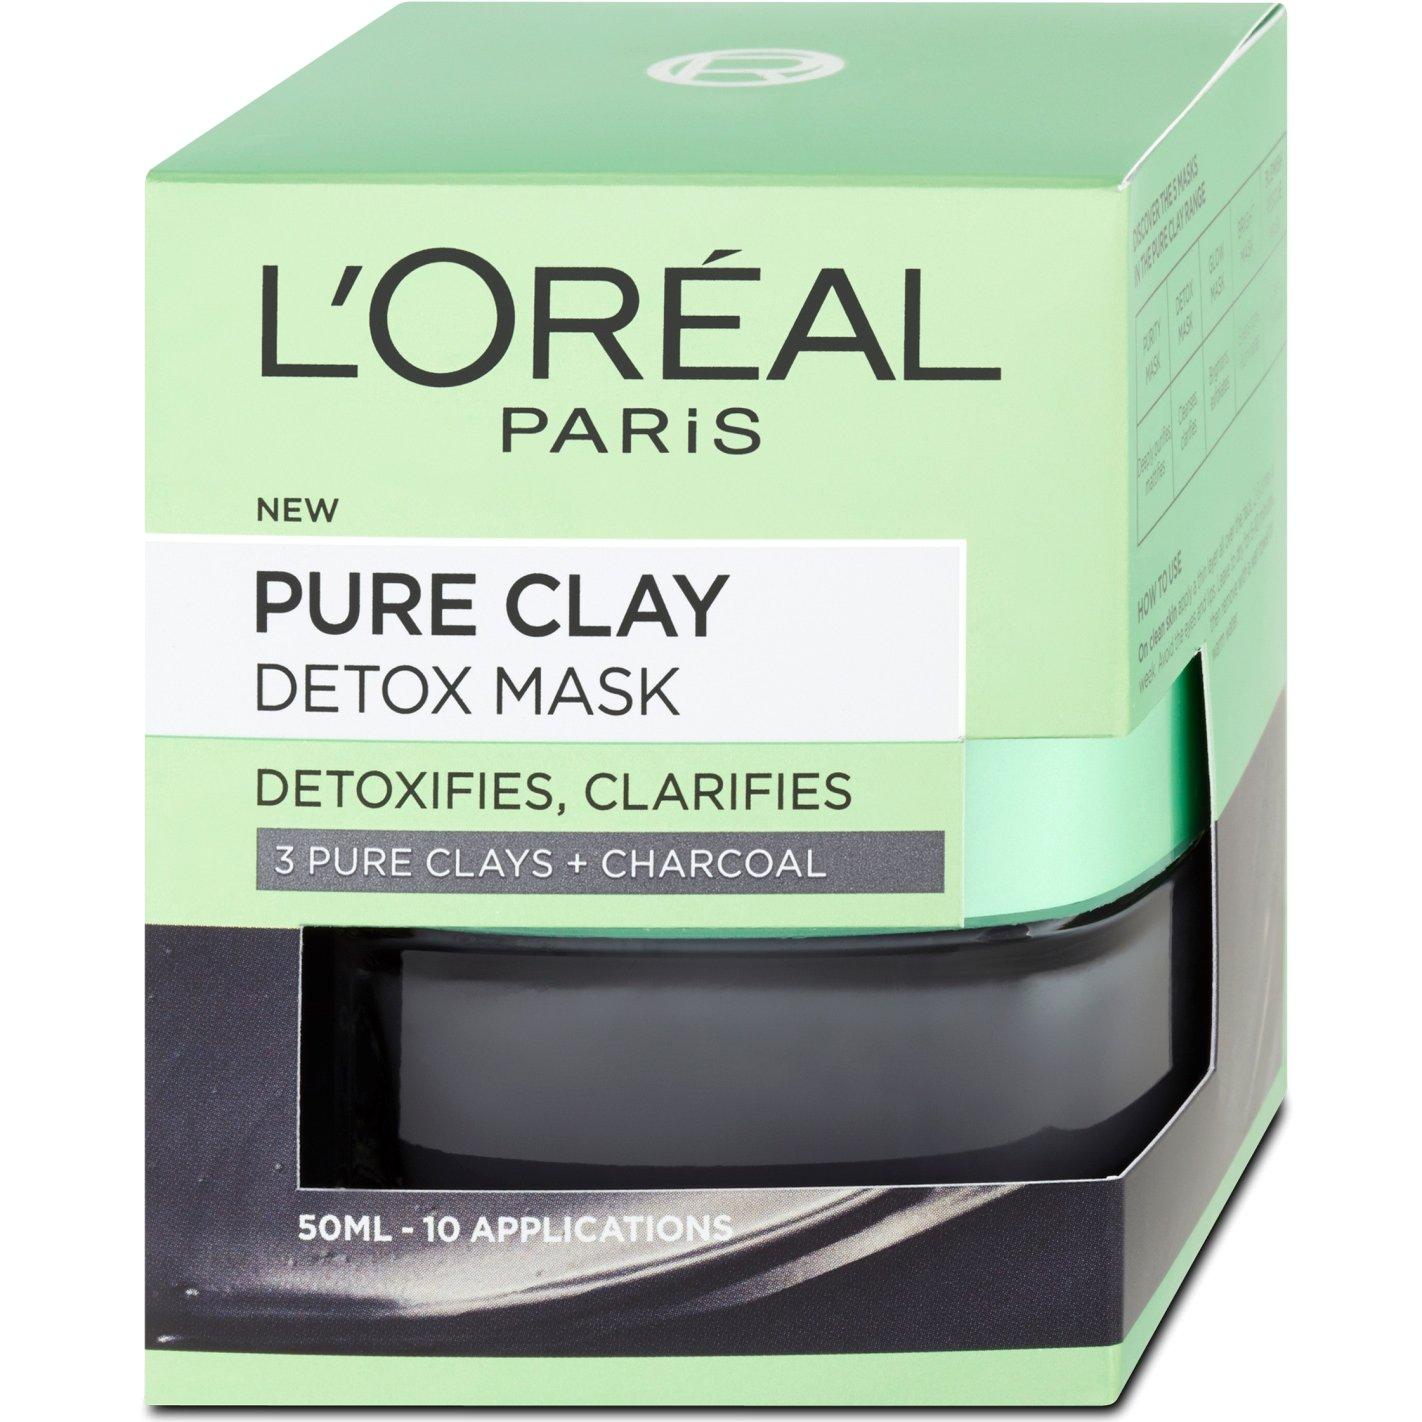 L'oreal Paris Pure Clay Detox Mask Μάσκα Αργίλου για Βαθύ Καθαρισμό & Λάμψη 50ml